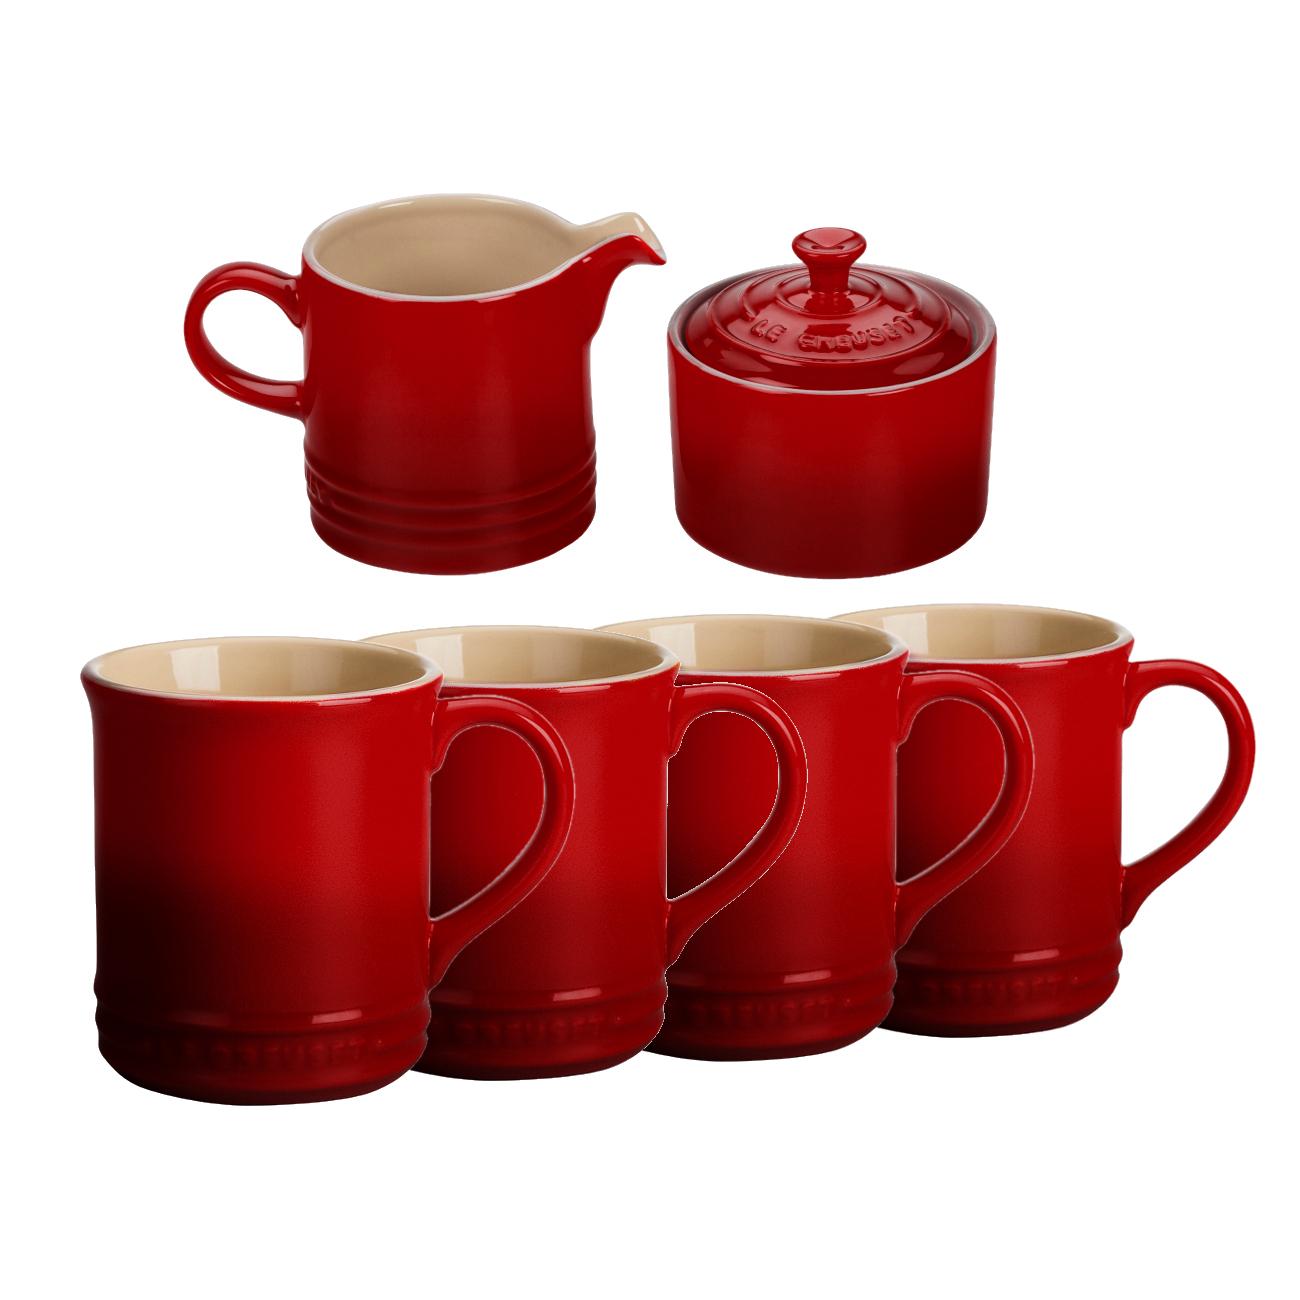 Le Creuset Cherry Stoneware 6 Piece Coffee or Tea Service Set with Mugs and Cream & Sugar Set